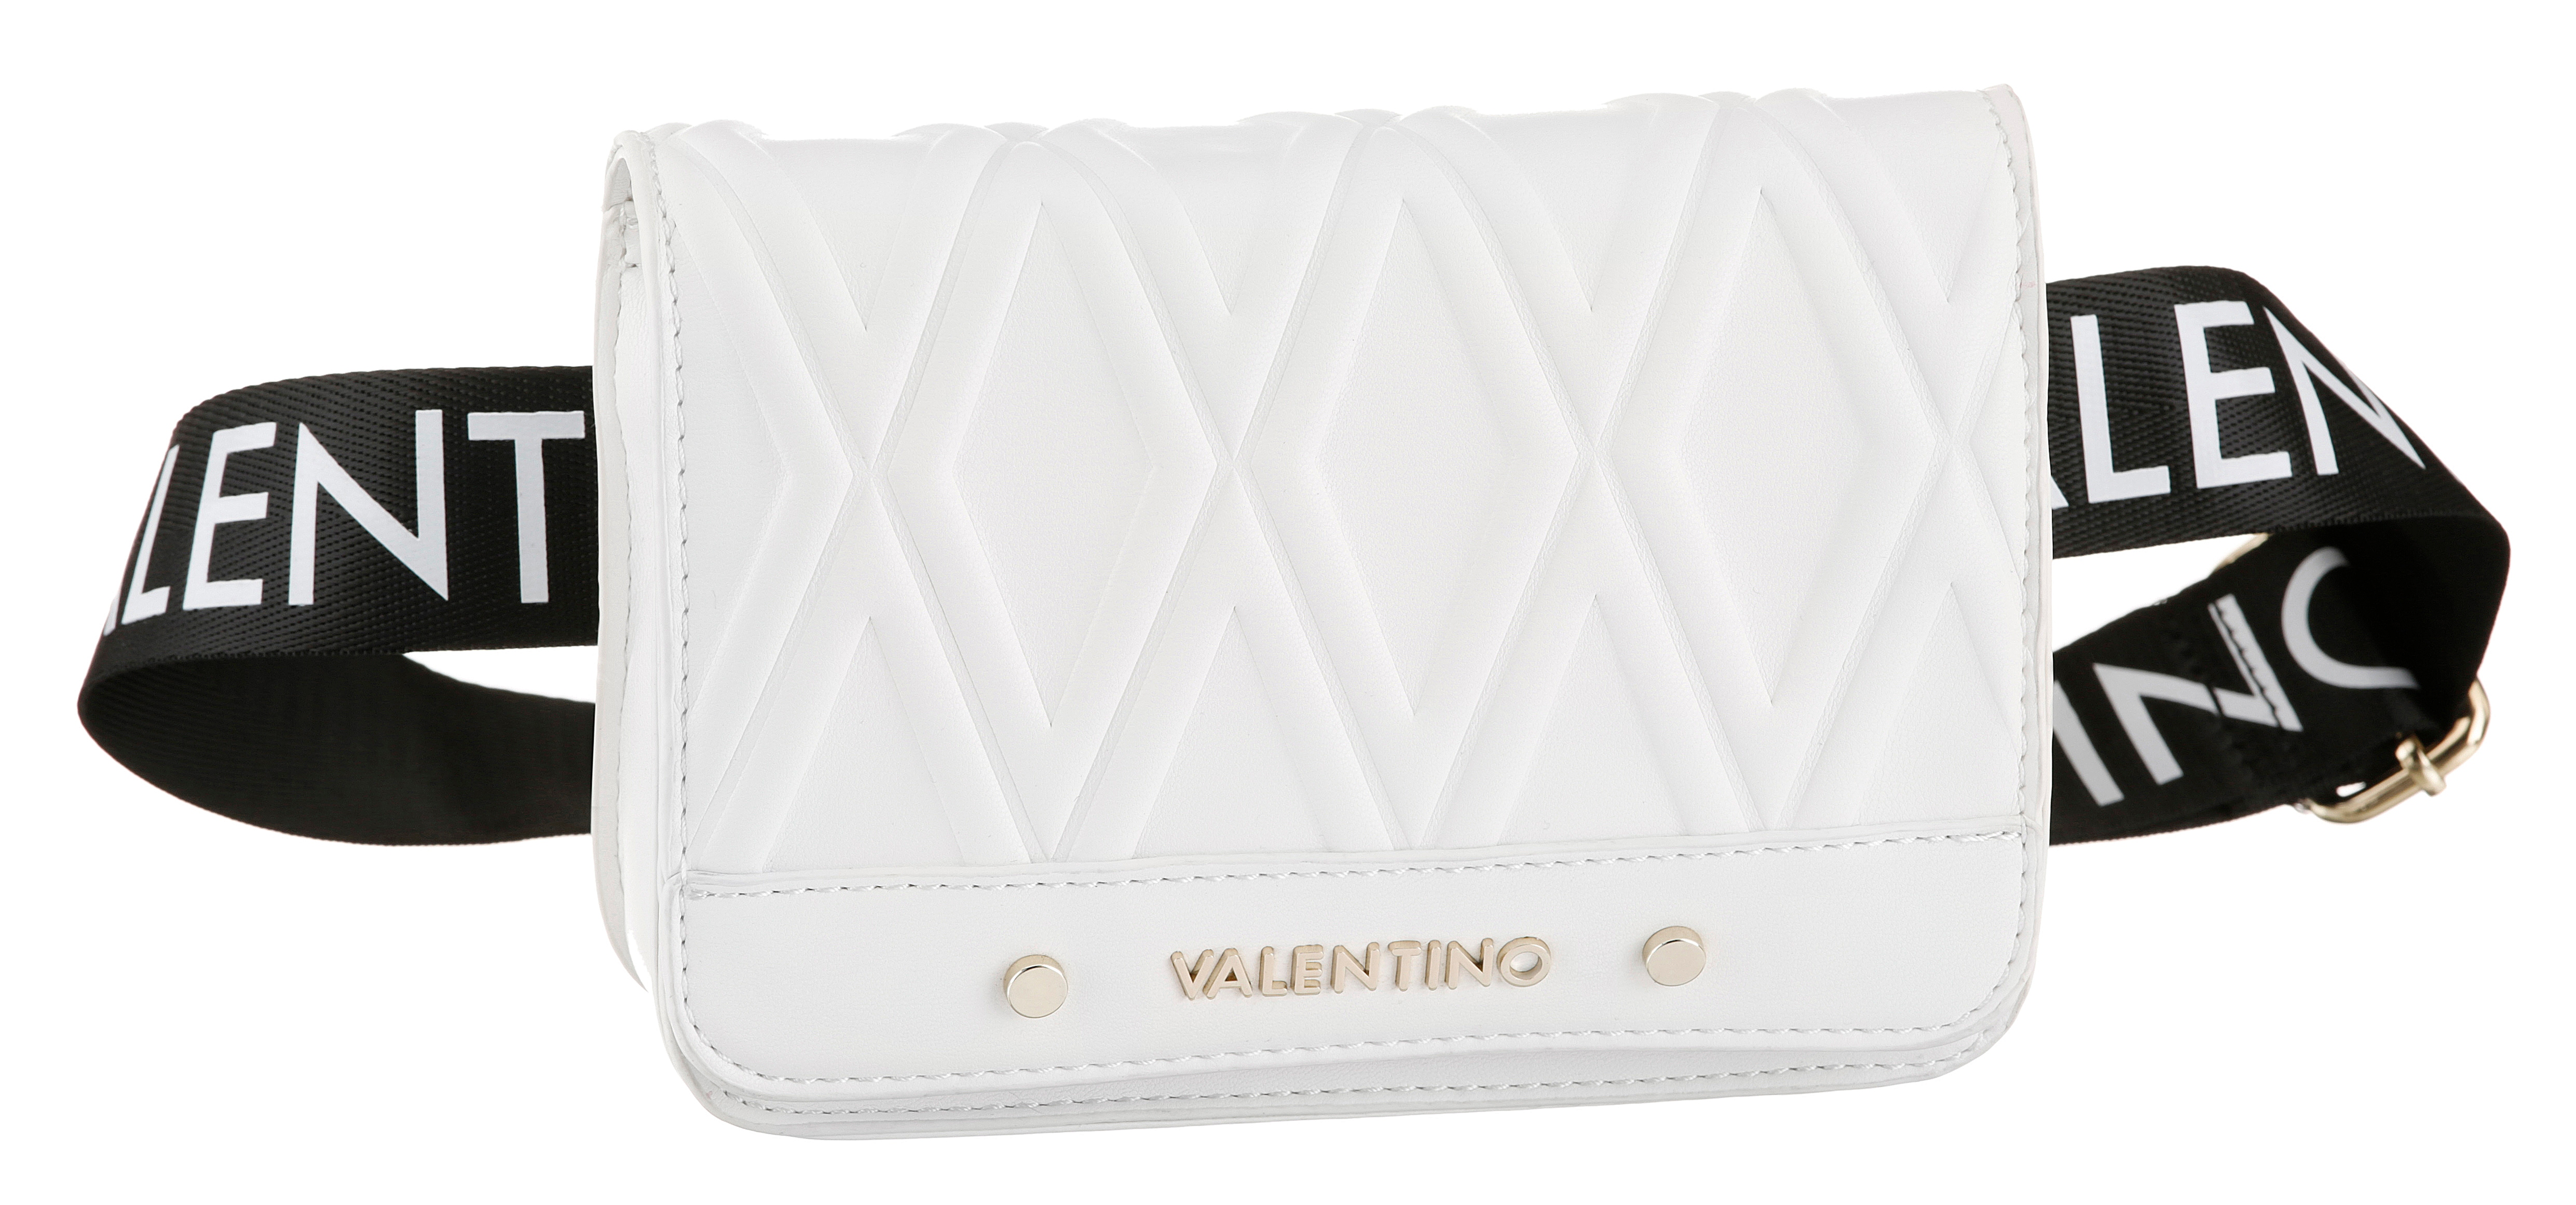 valentino bags -  Mini Bag Pepa, Crossbody oder als Bauchtasche tragbar